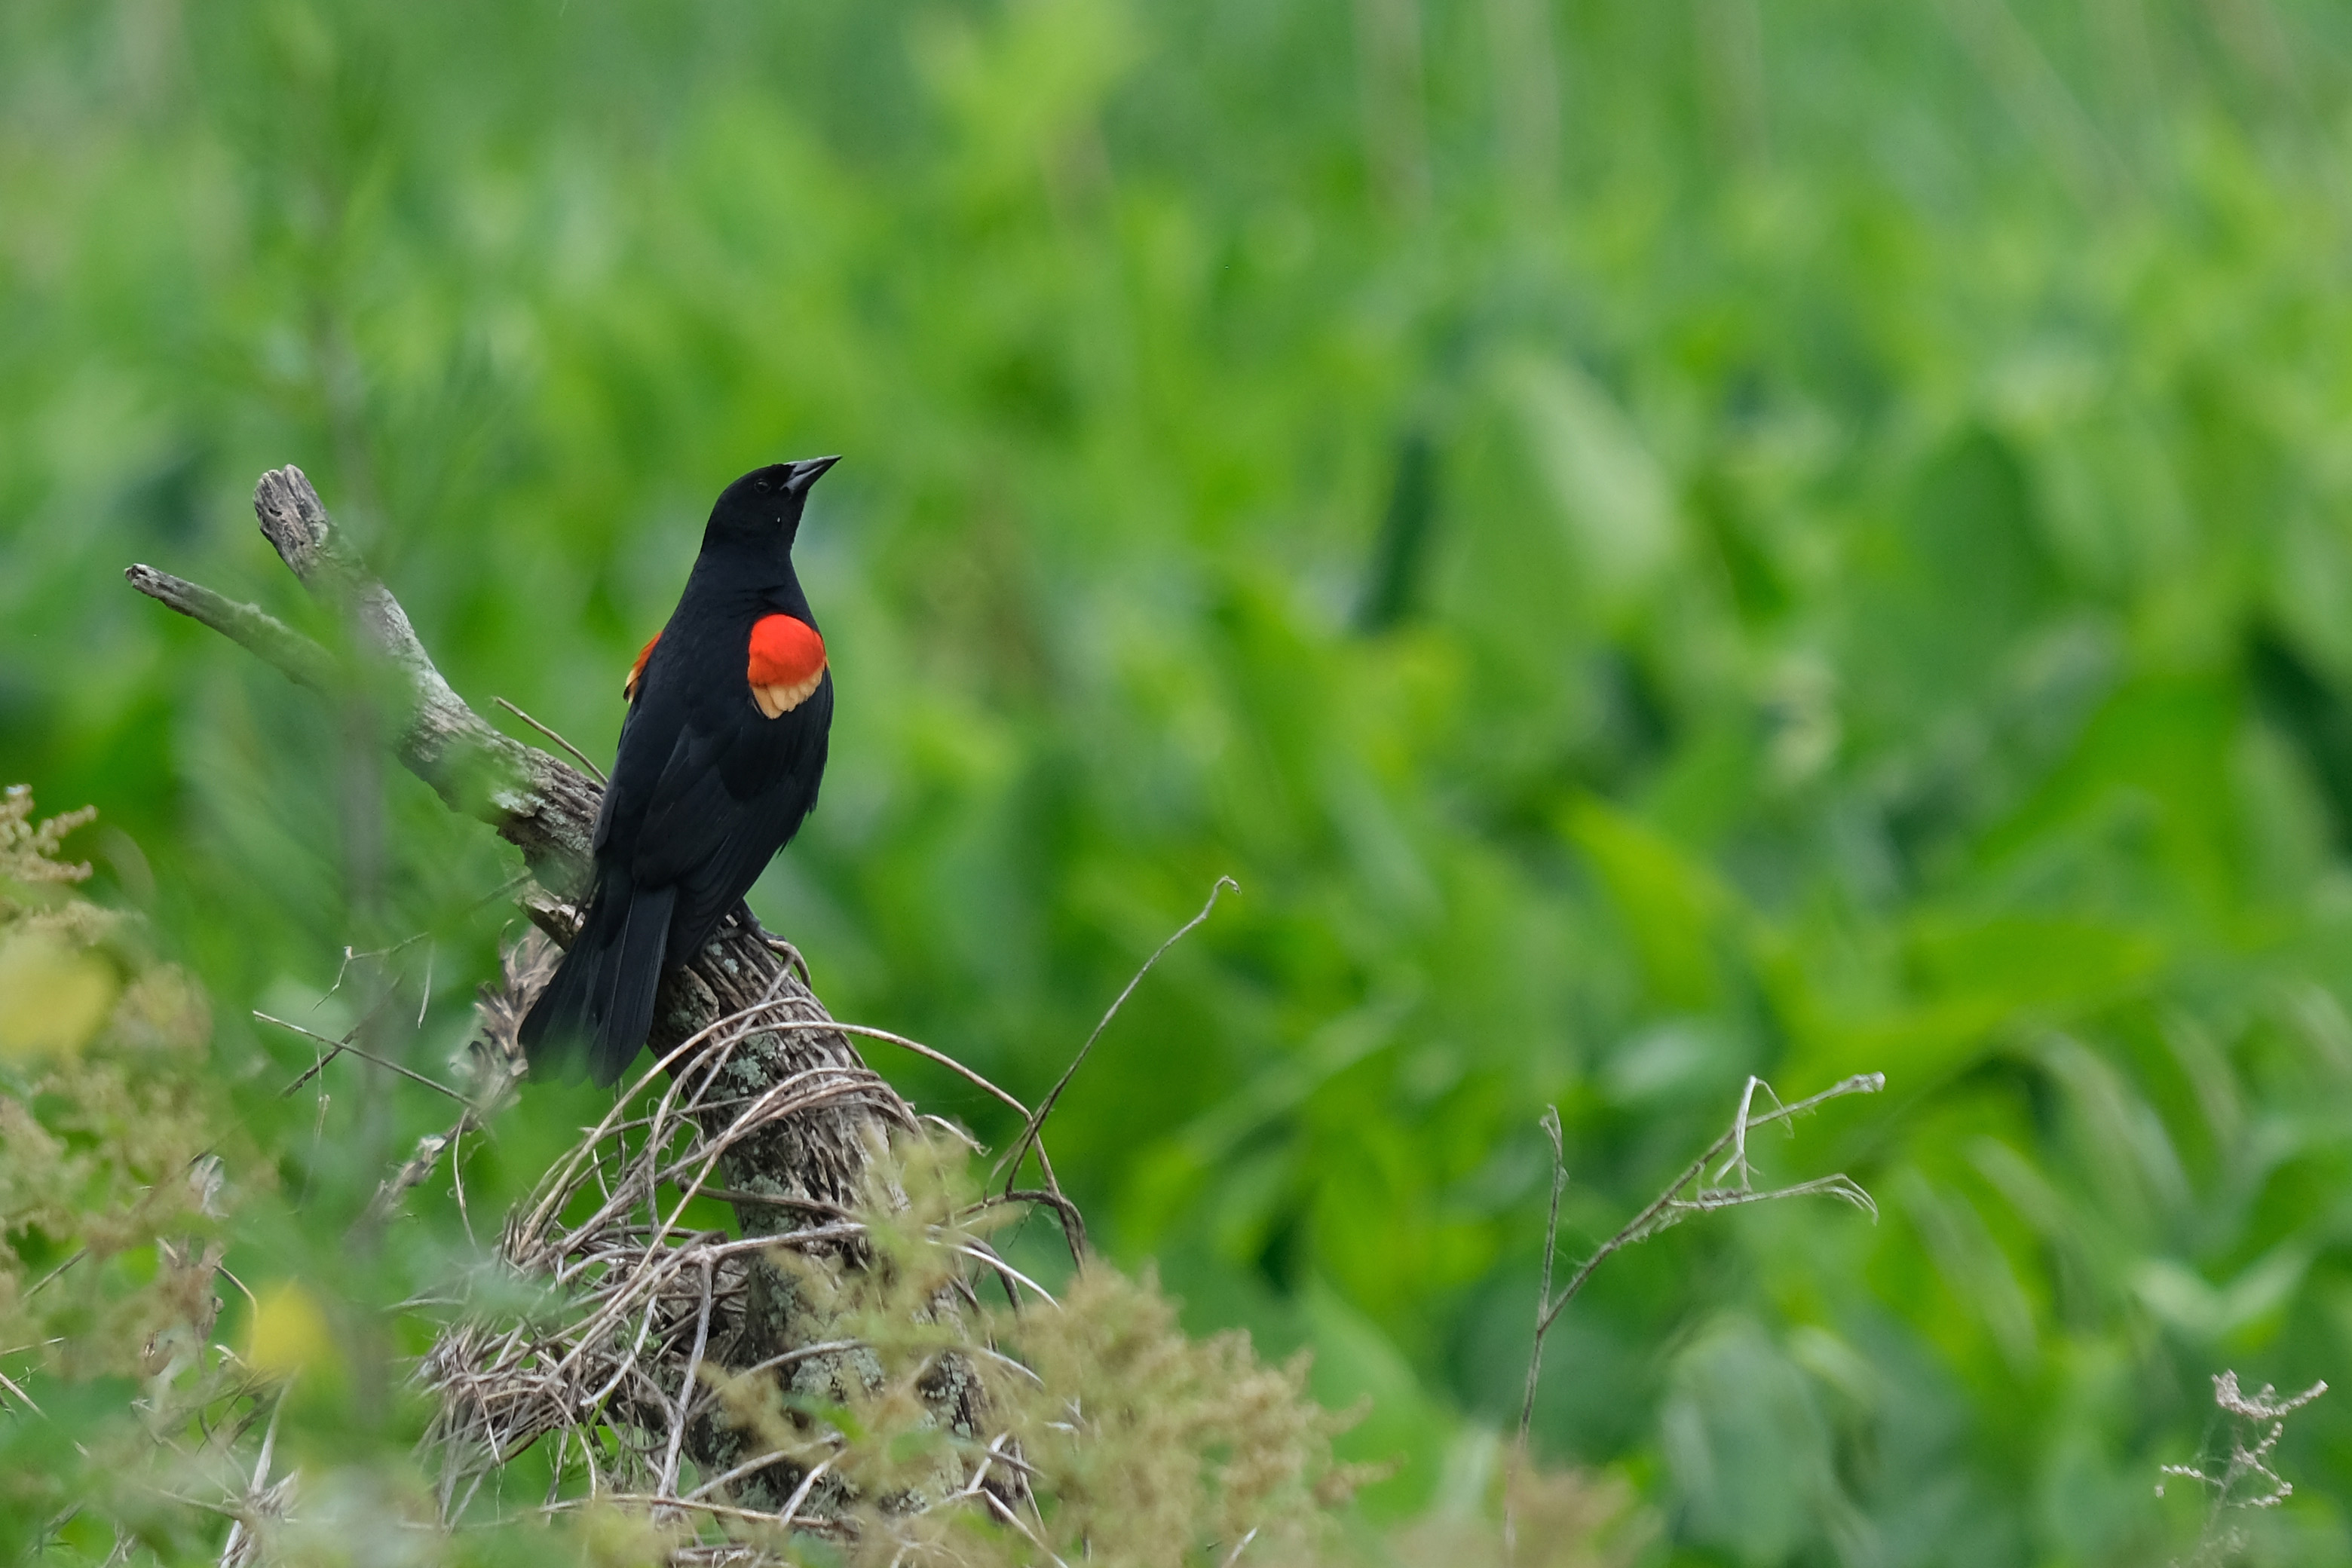 Redwinged blackbird Photo by Marci Green